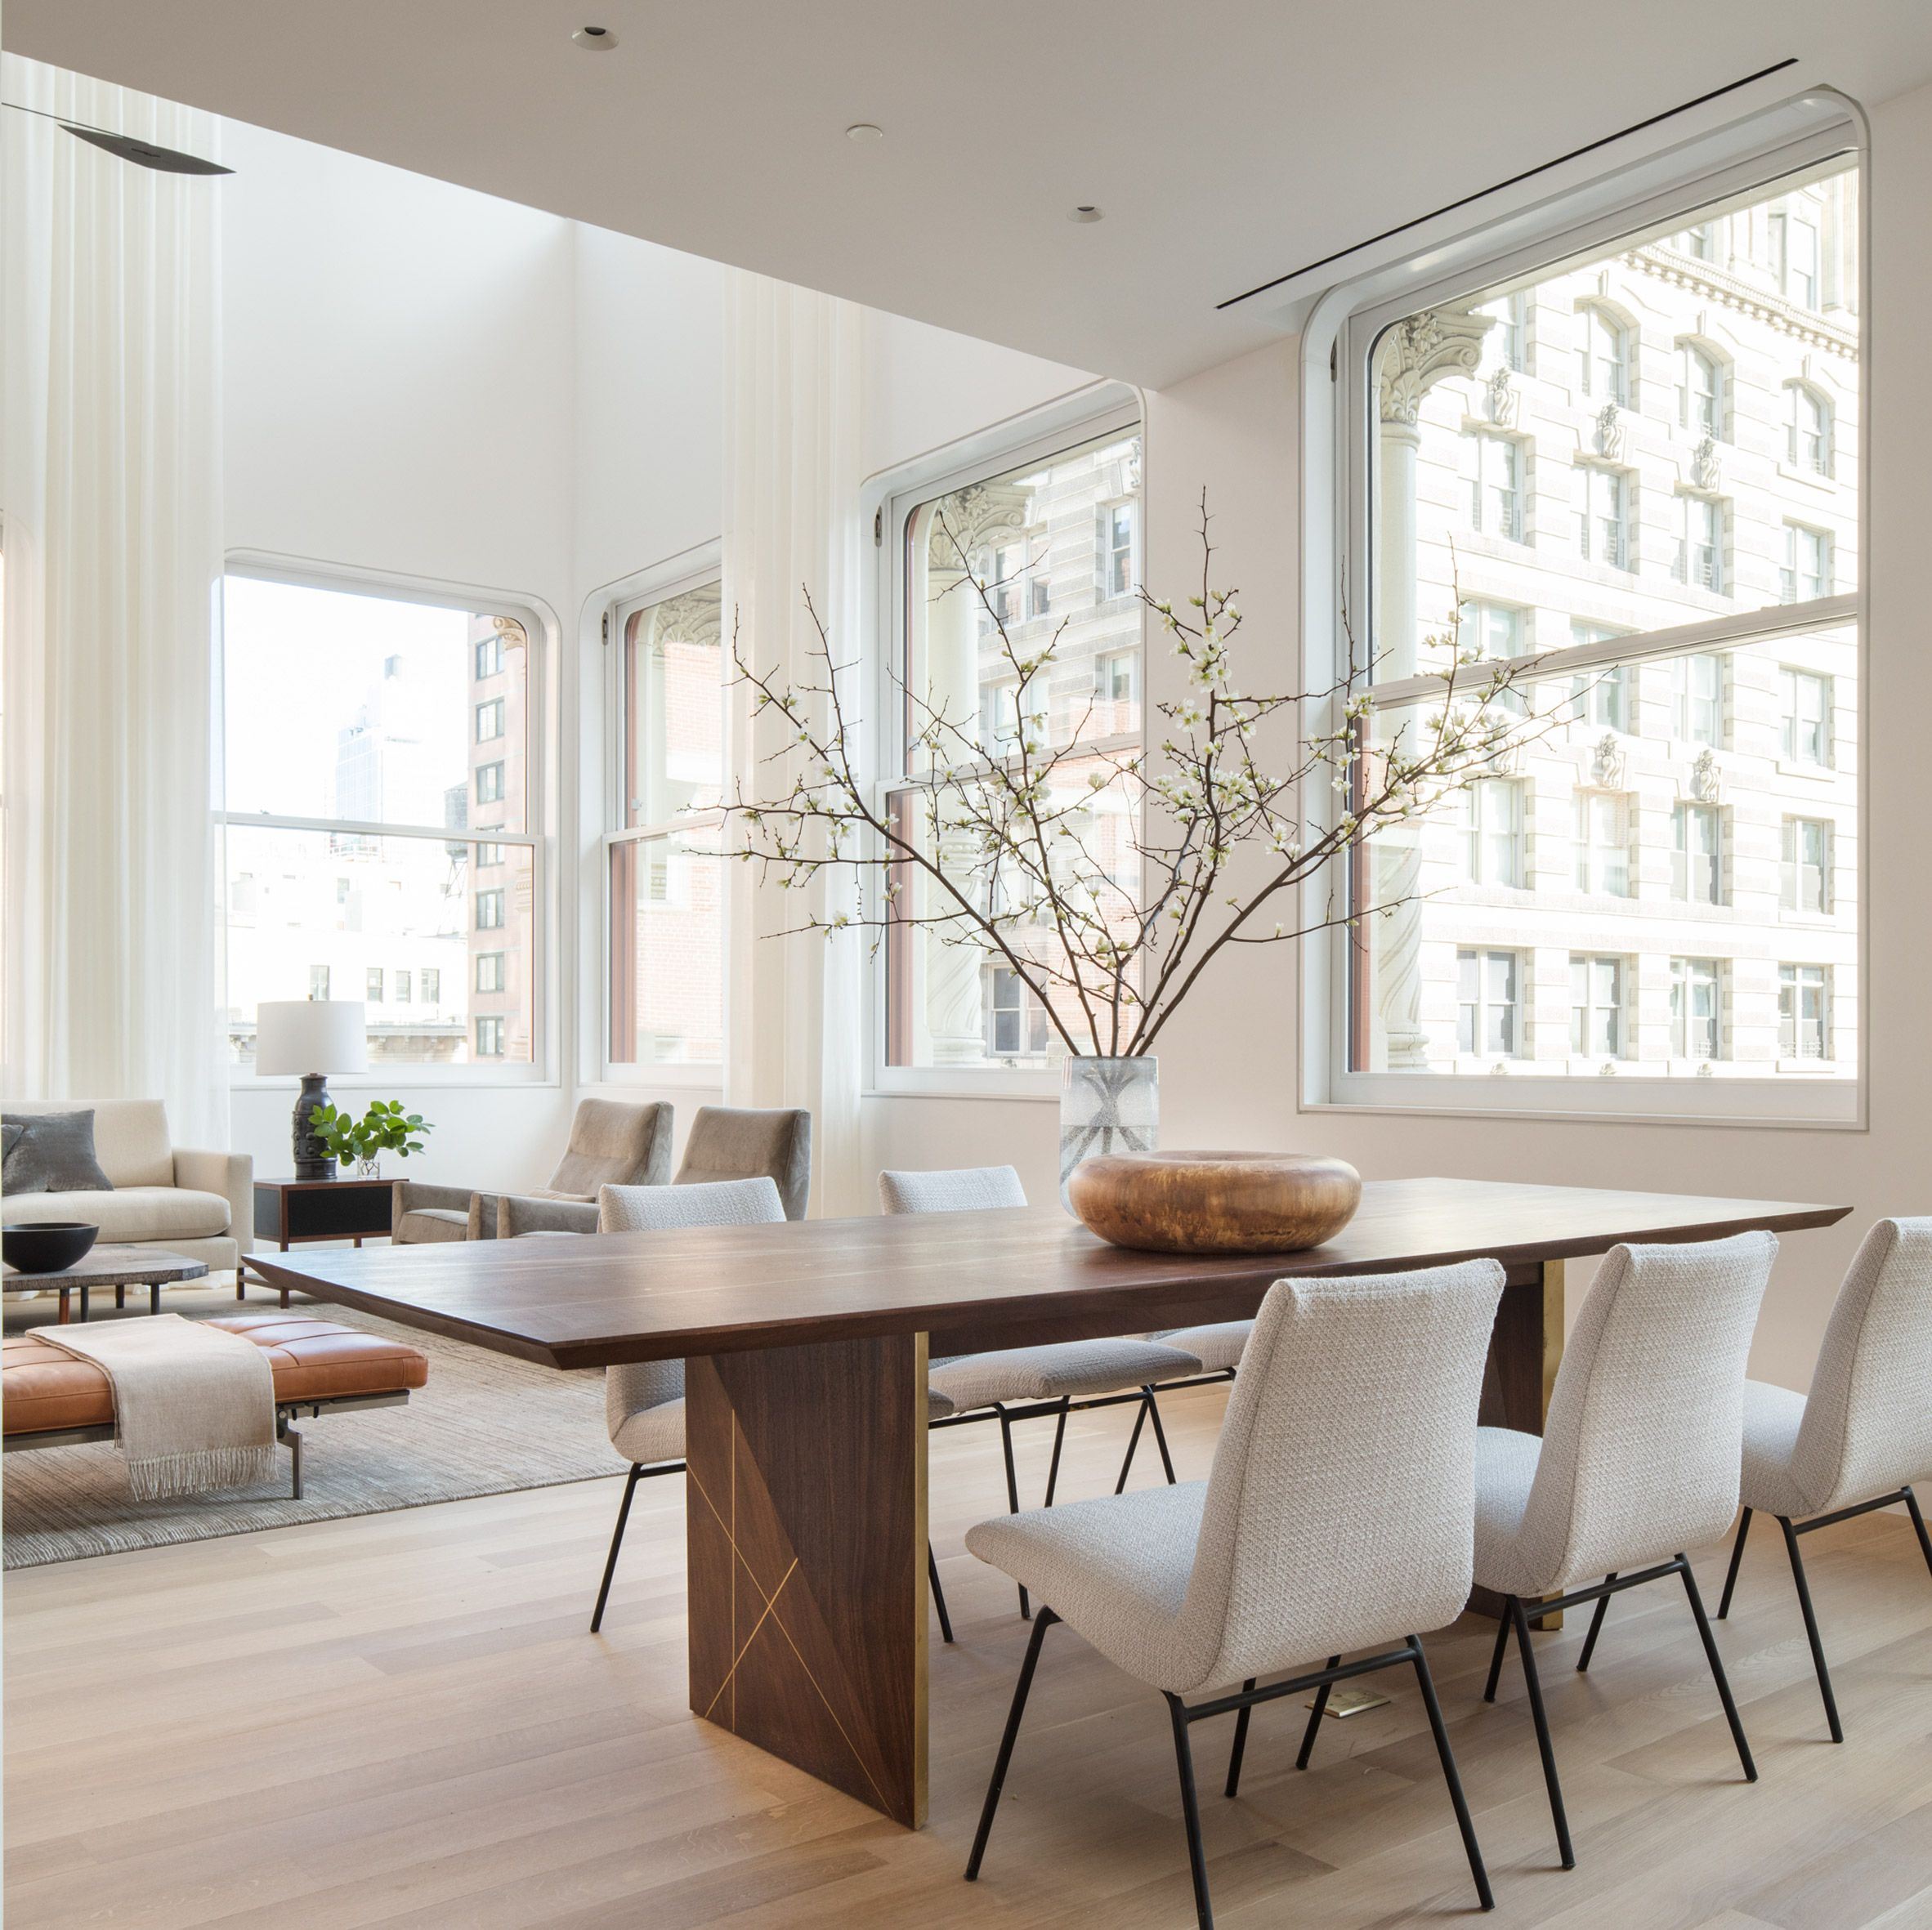 Photography scott frances sweet home make sweethomemake interior decoration design ideas decor also rh co pinterest